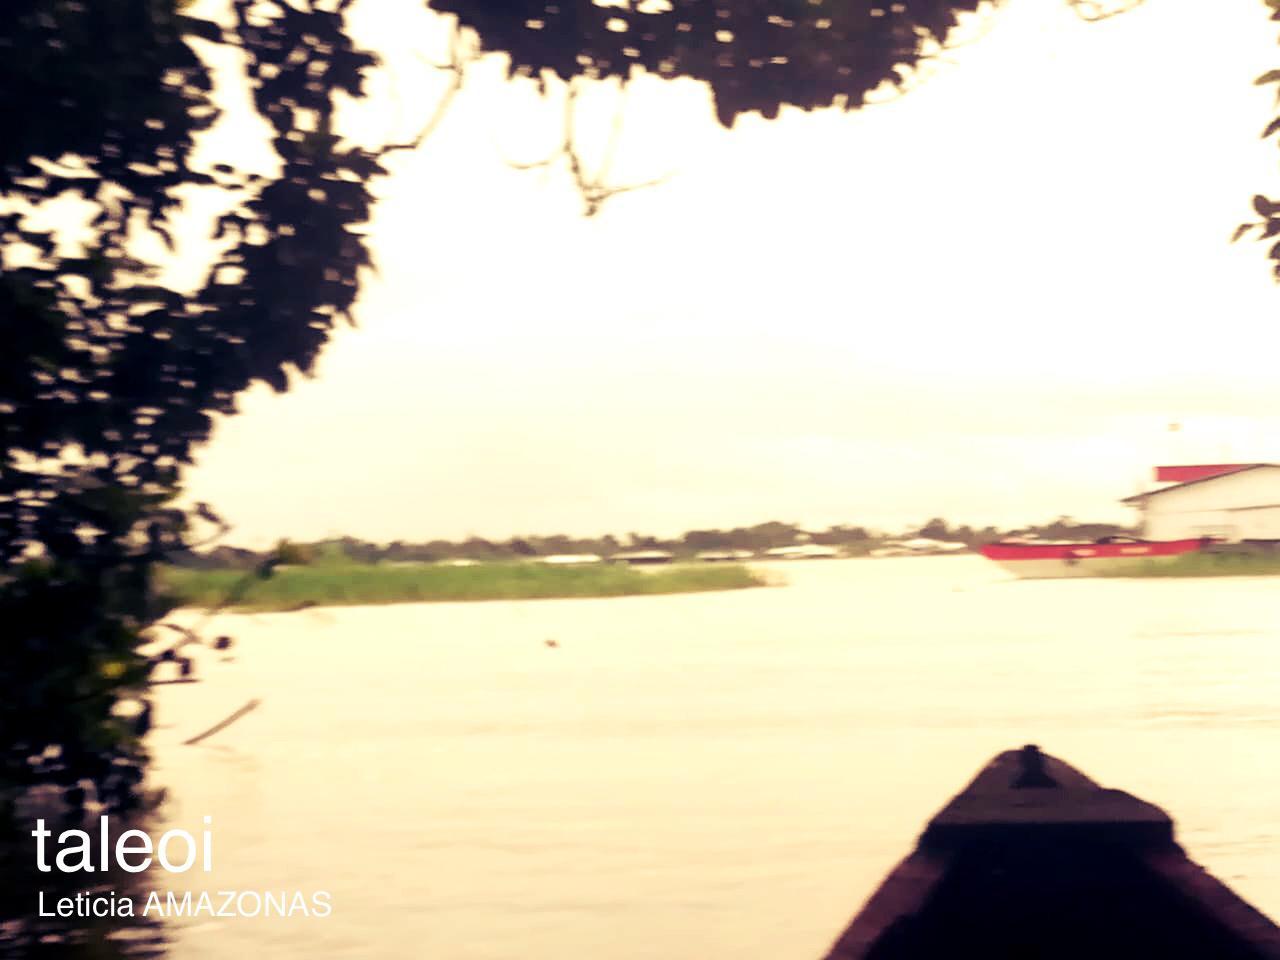 Canoa entrando Leticia Amazonas